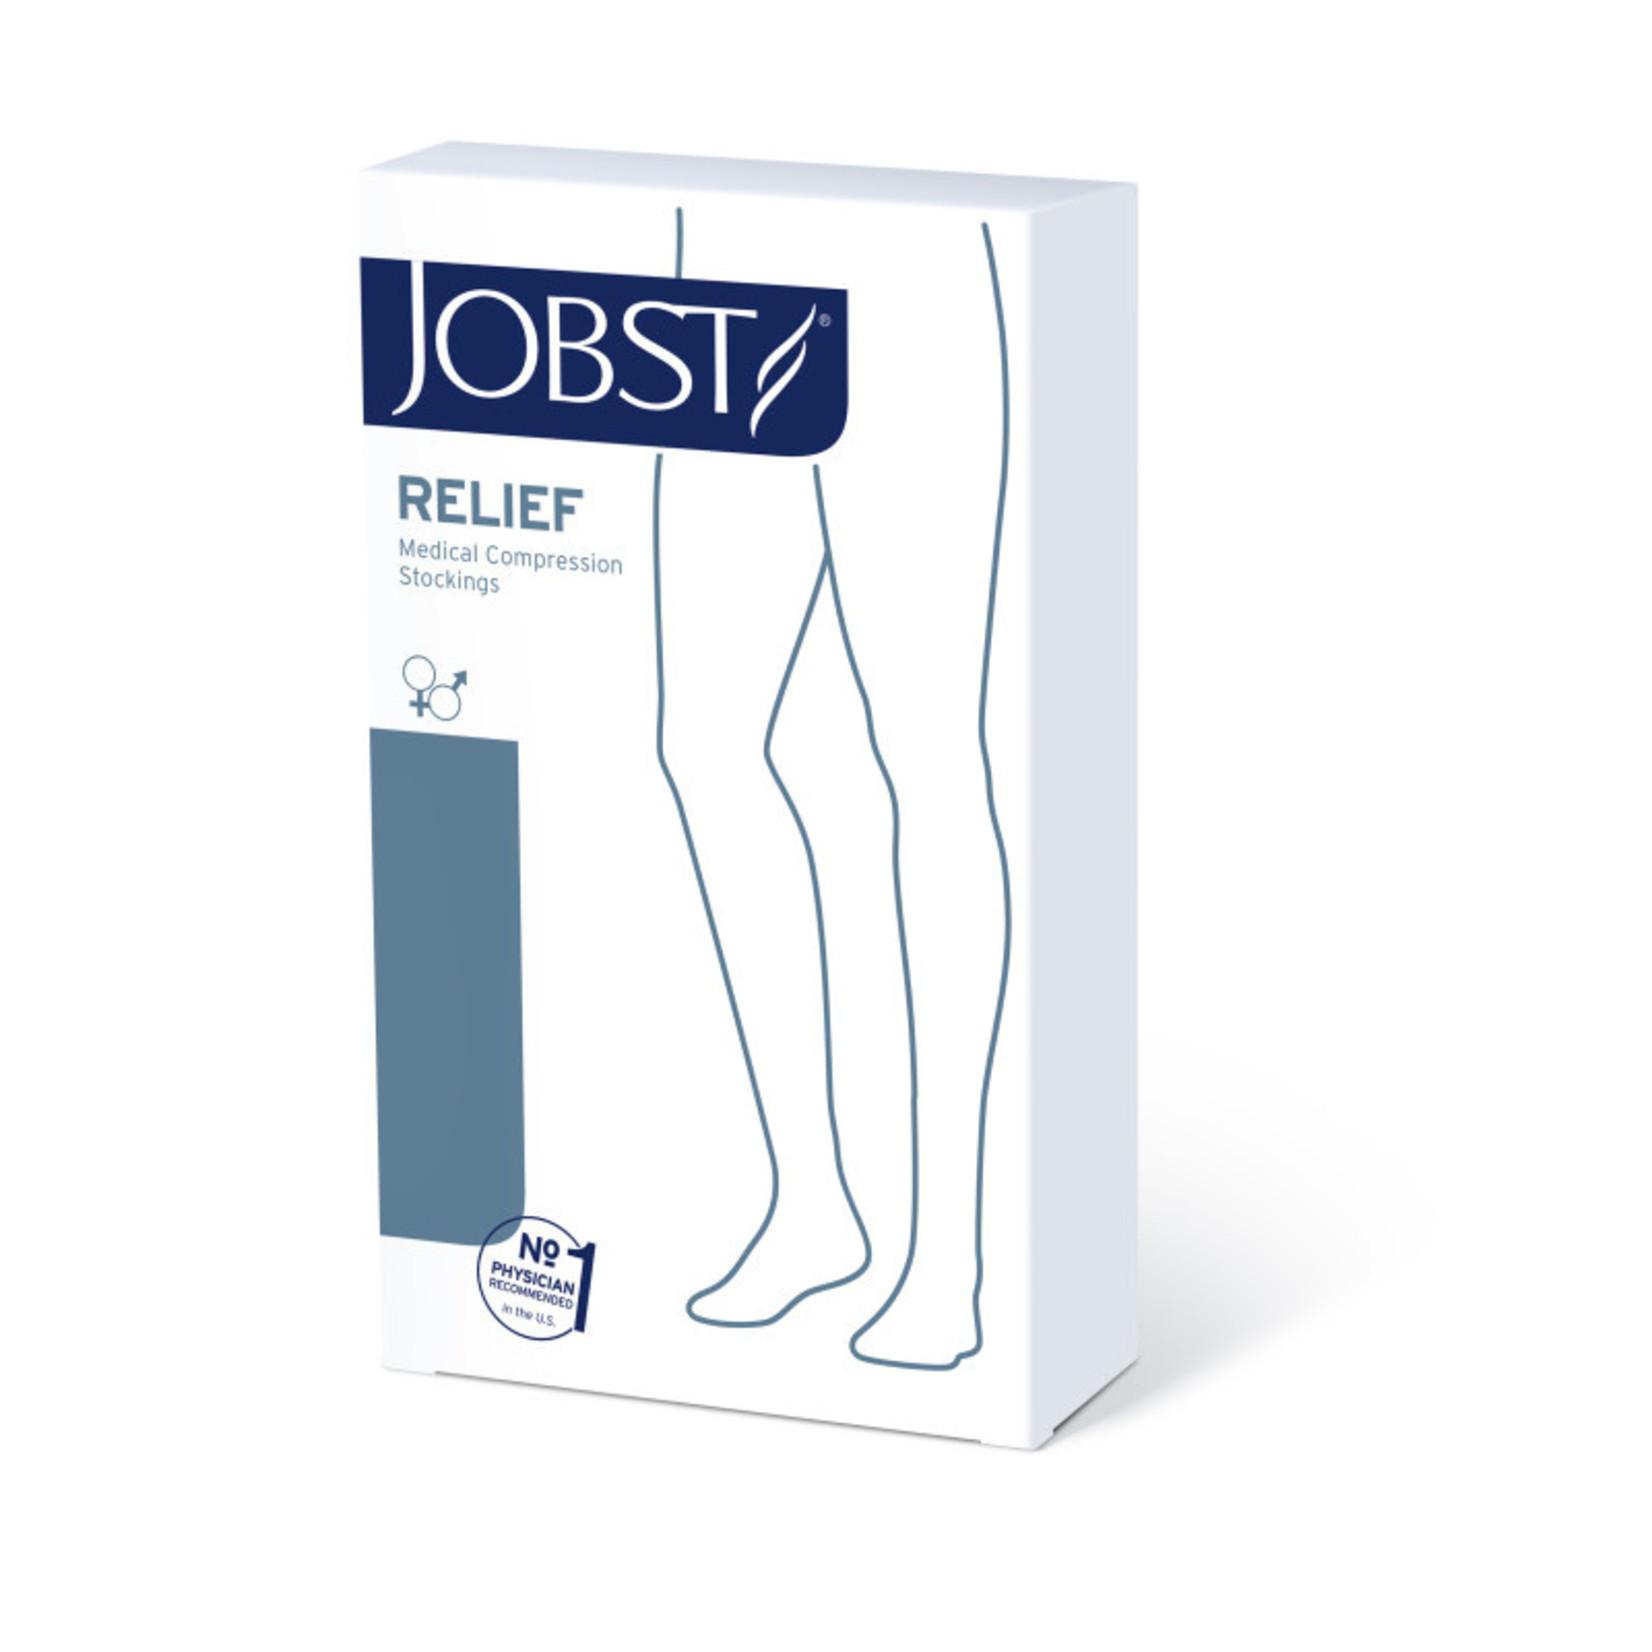 JOBST JOBST Relief Left Leg Chap, 20-30 mmHg Closed